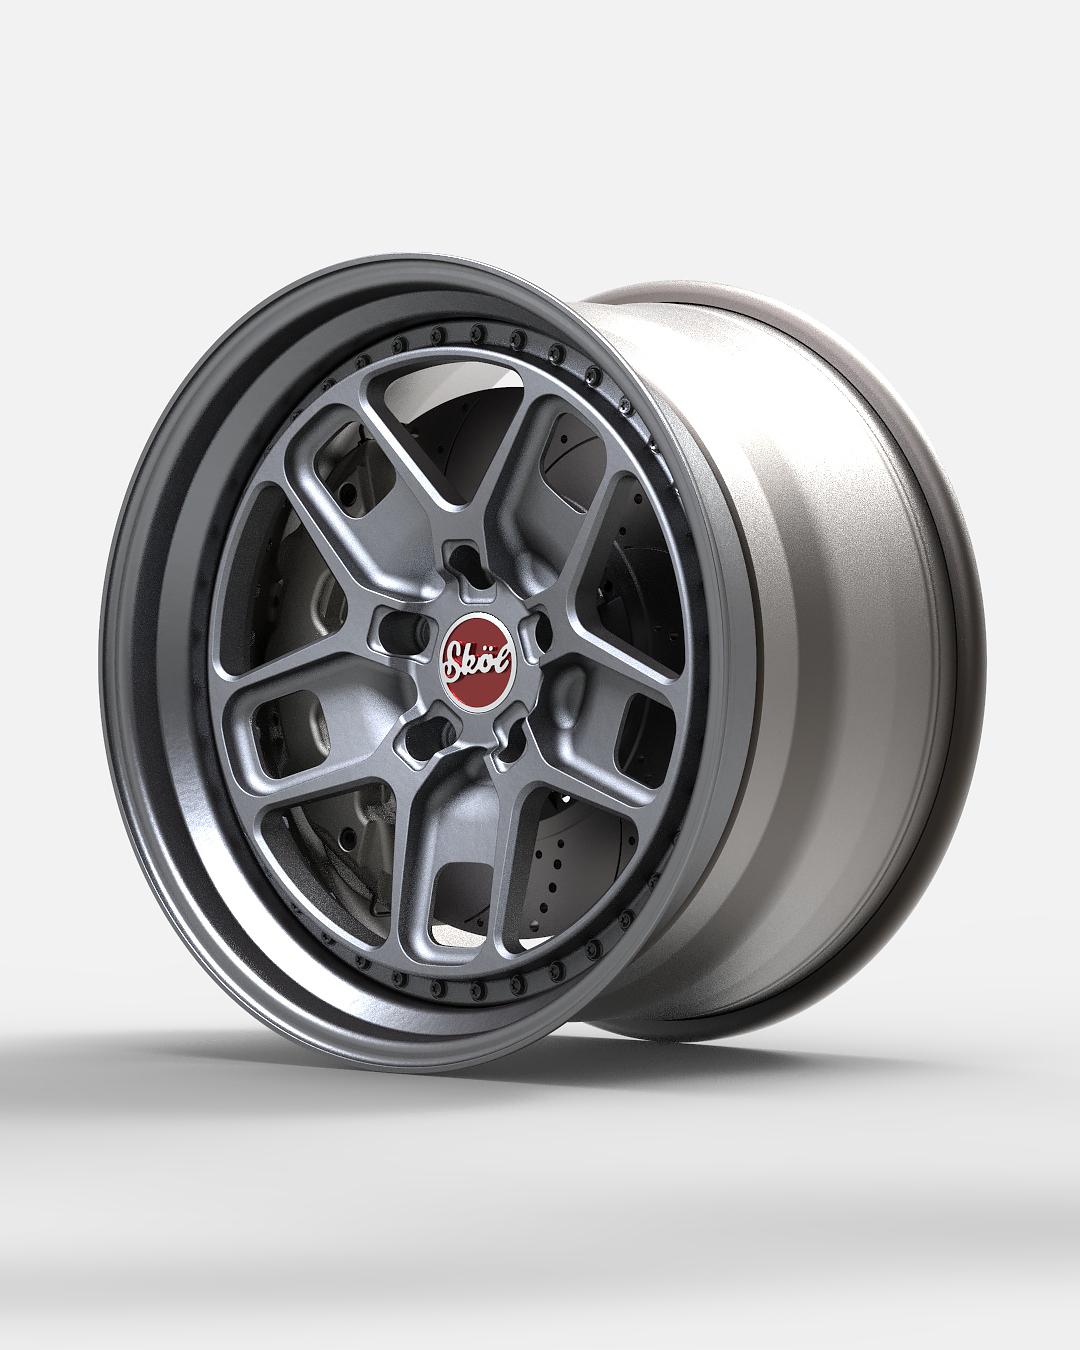 SKÖL SK15 forged wheels